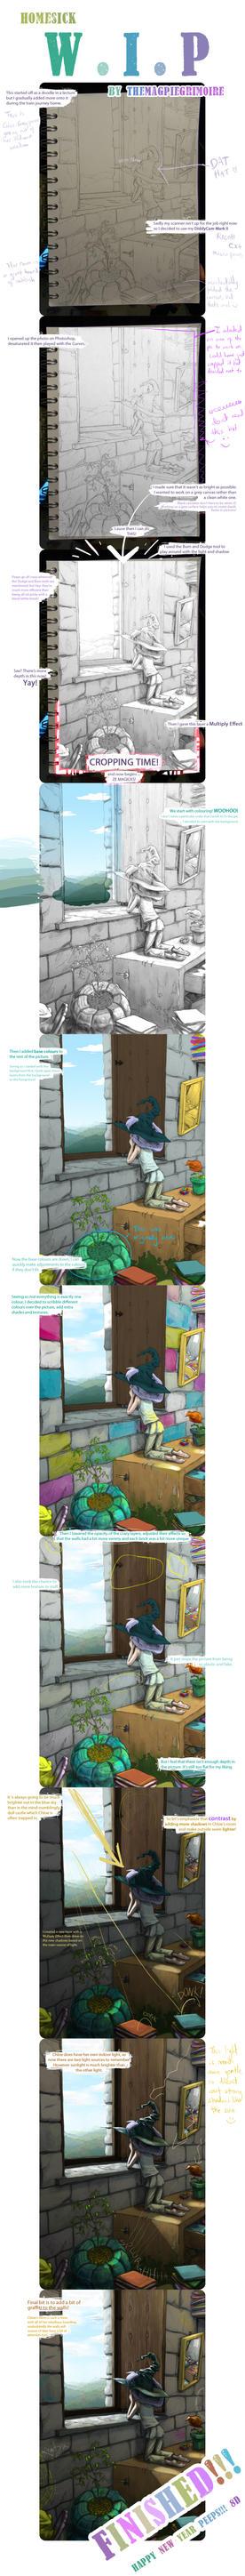 Homesick W.I.P by Jackoburra